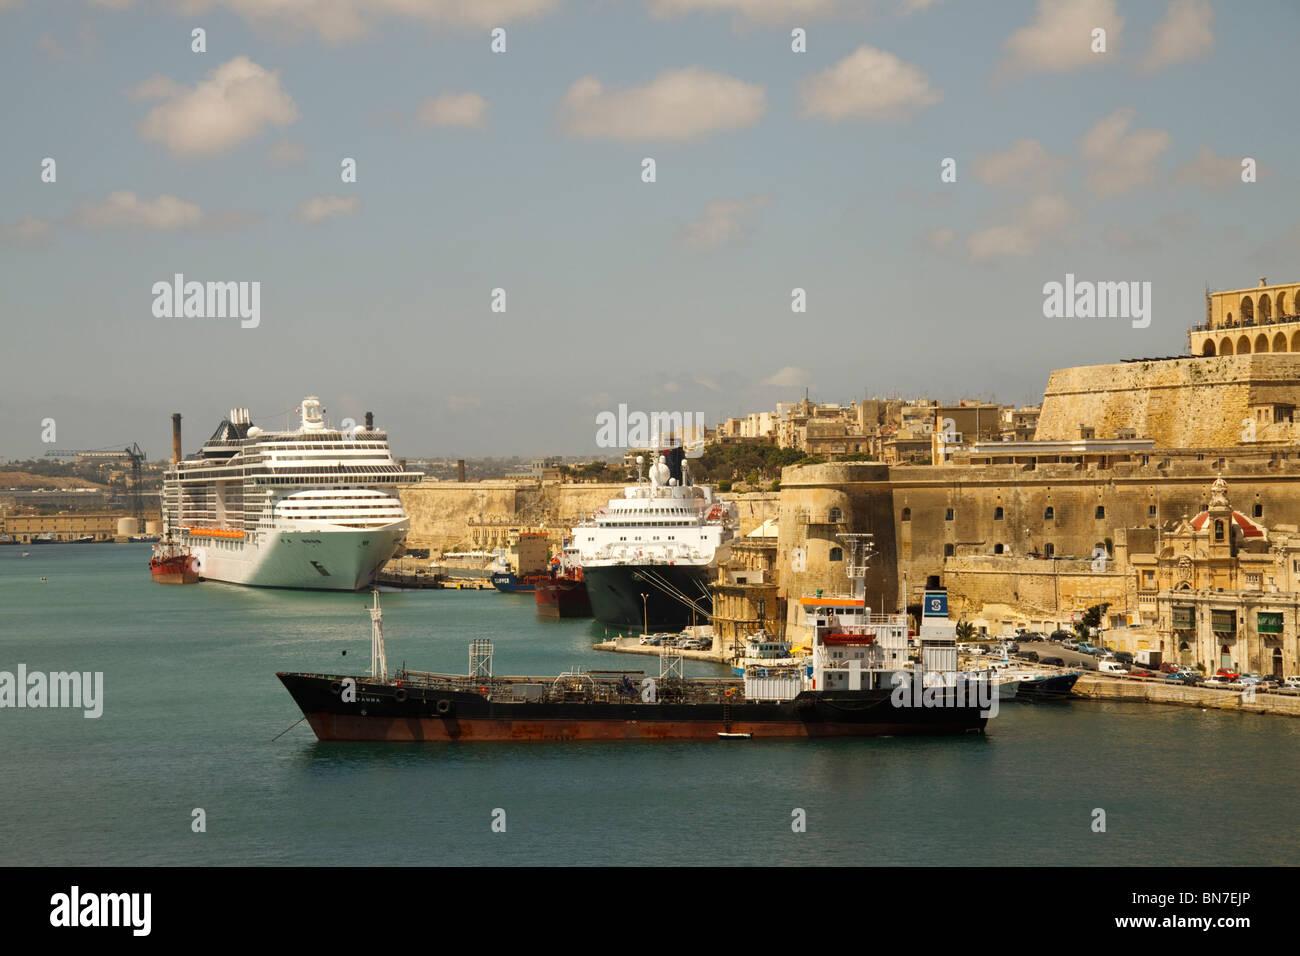 Ships in the Grand Harbour, Valletta, Malta - Stock Image